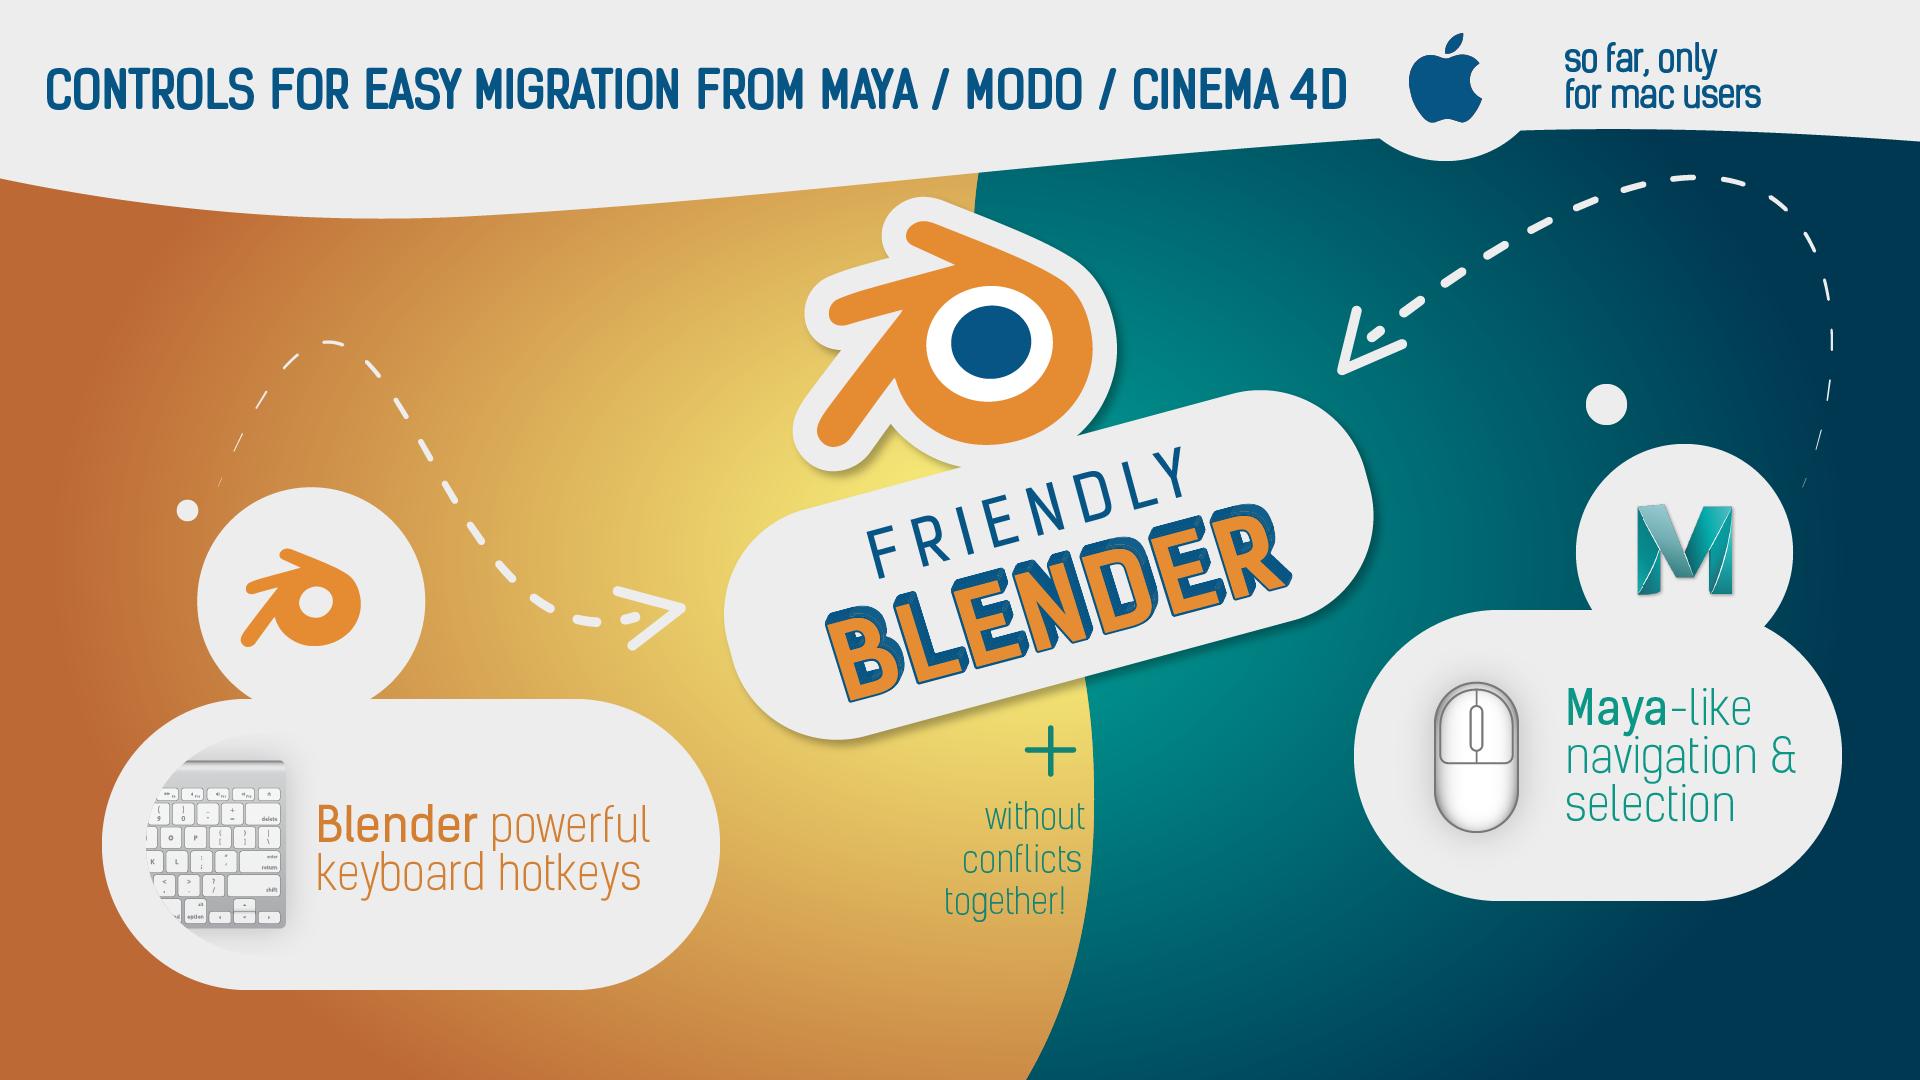 Friendly Blender (Controls for Maya/Modo/Cinema users) - BlenderNation